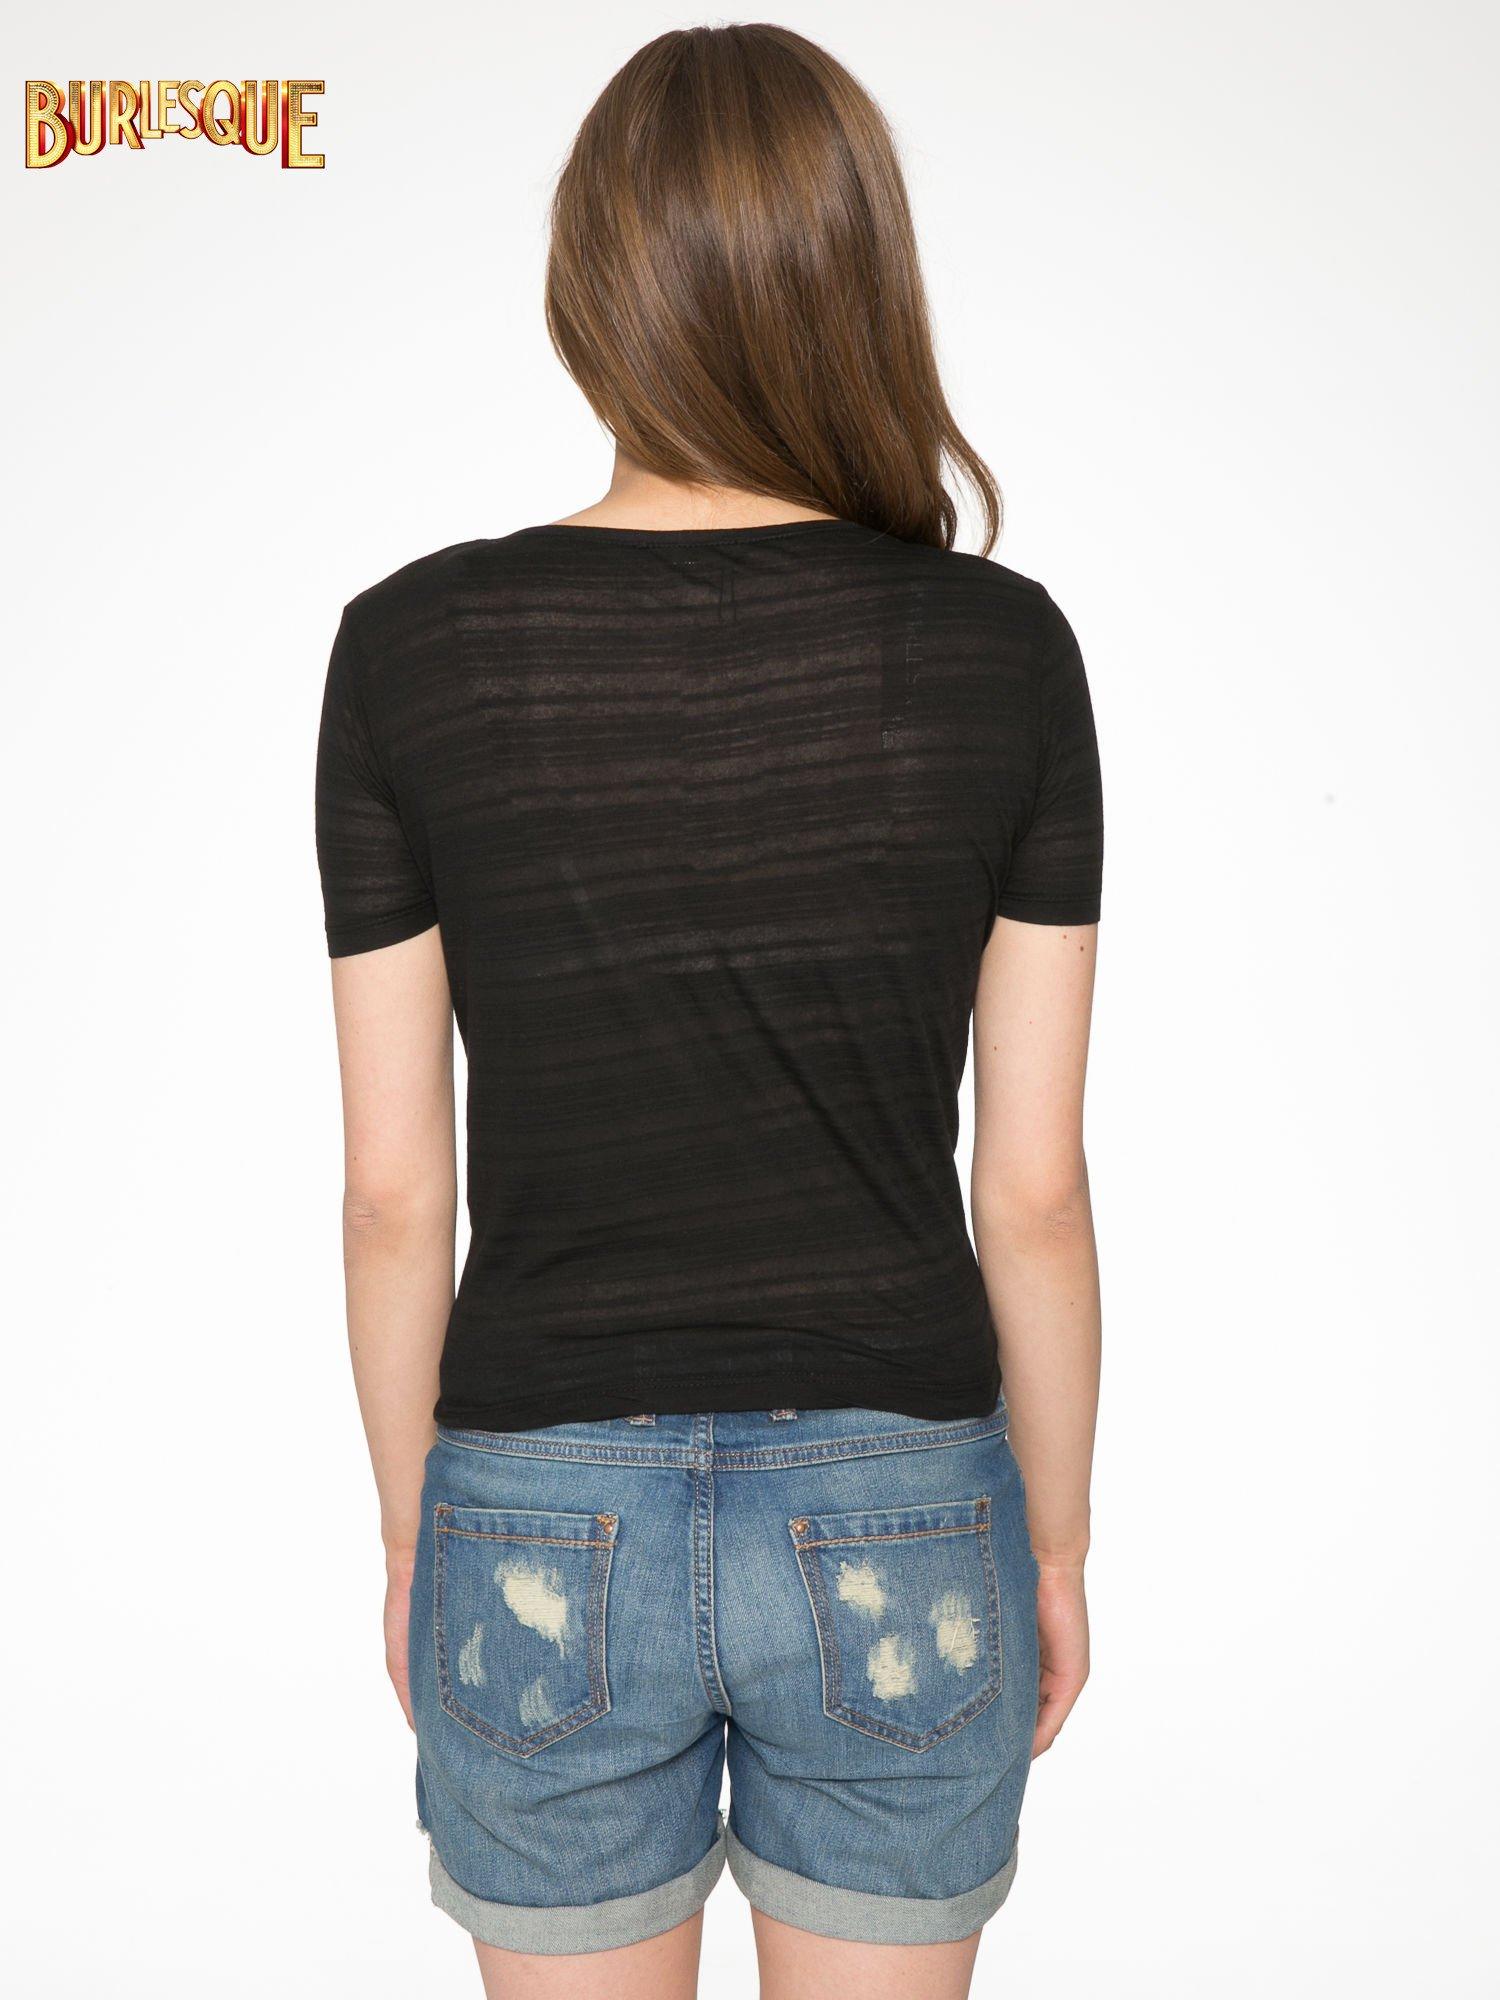 Czarny krótki t-shirt z napisem PARTY PERFECT FOREVER                                  zdj.                                  4